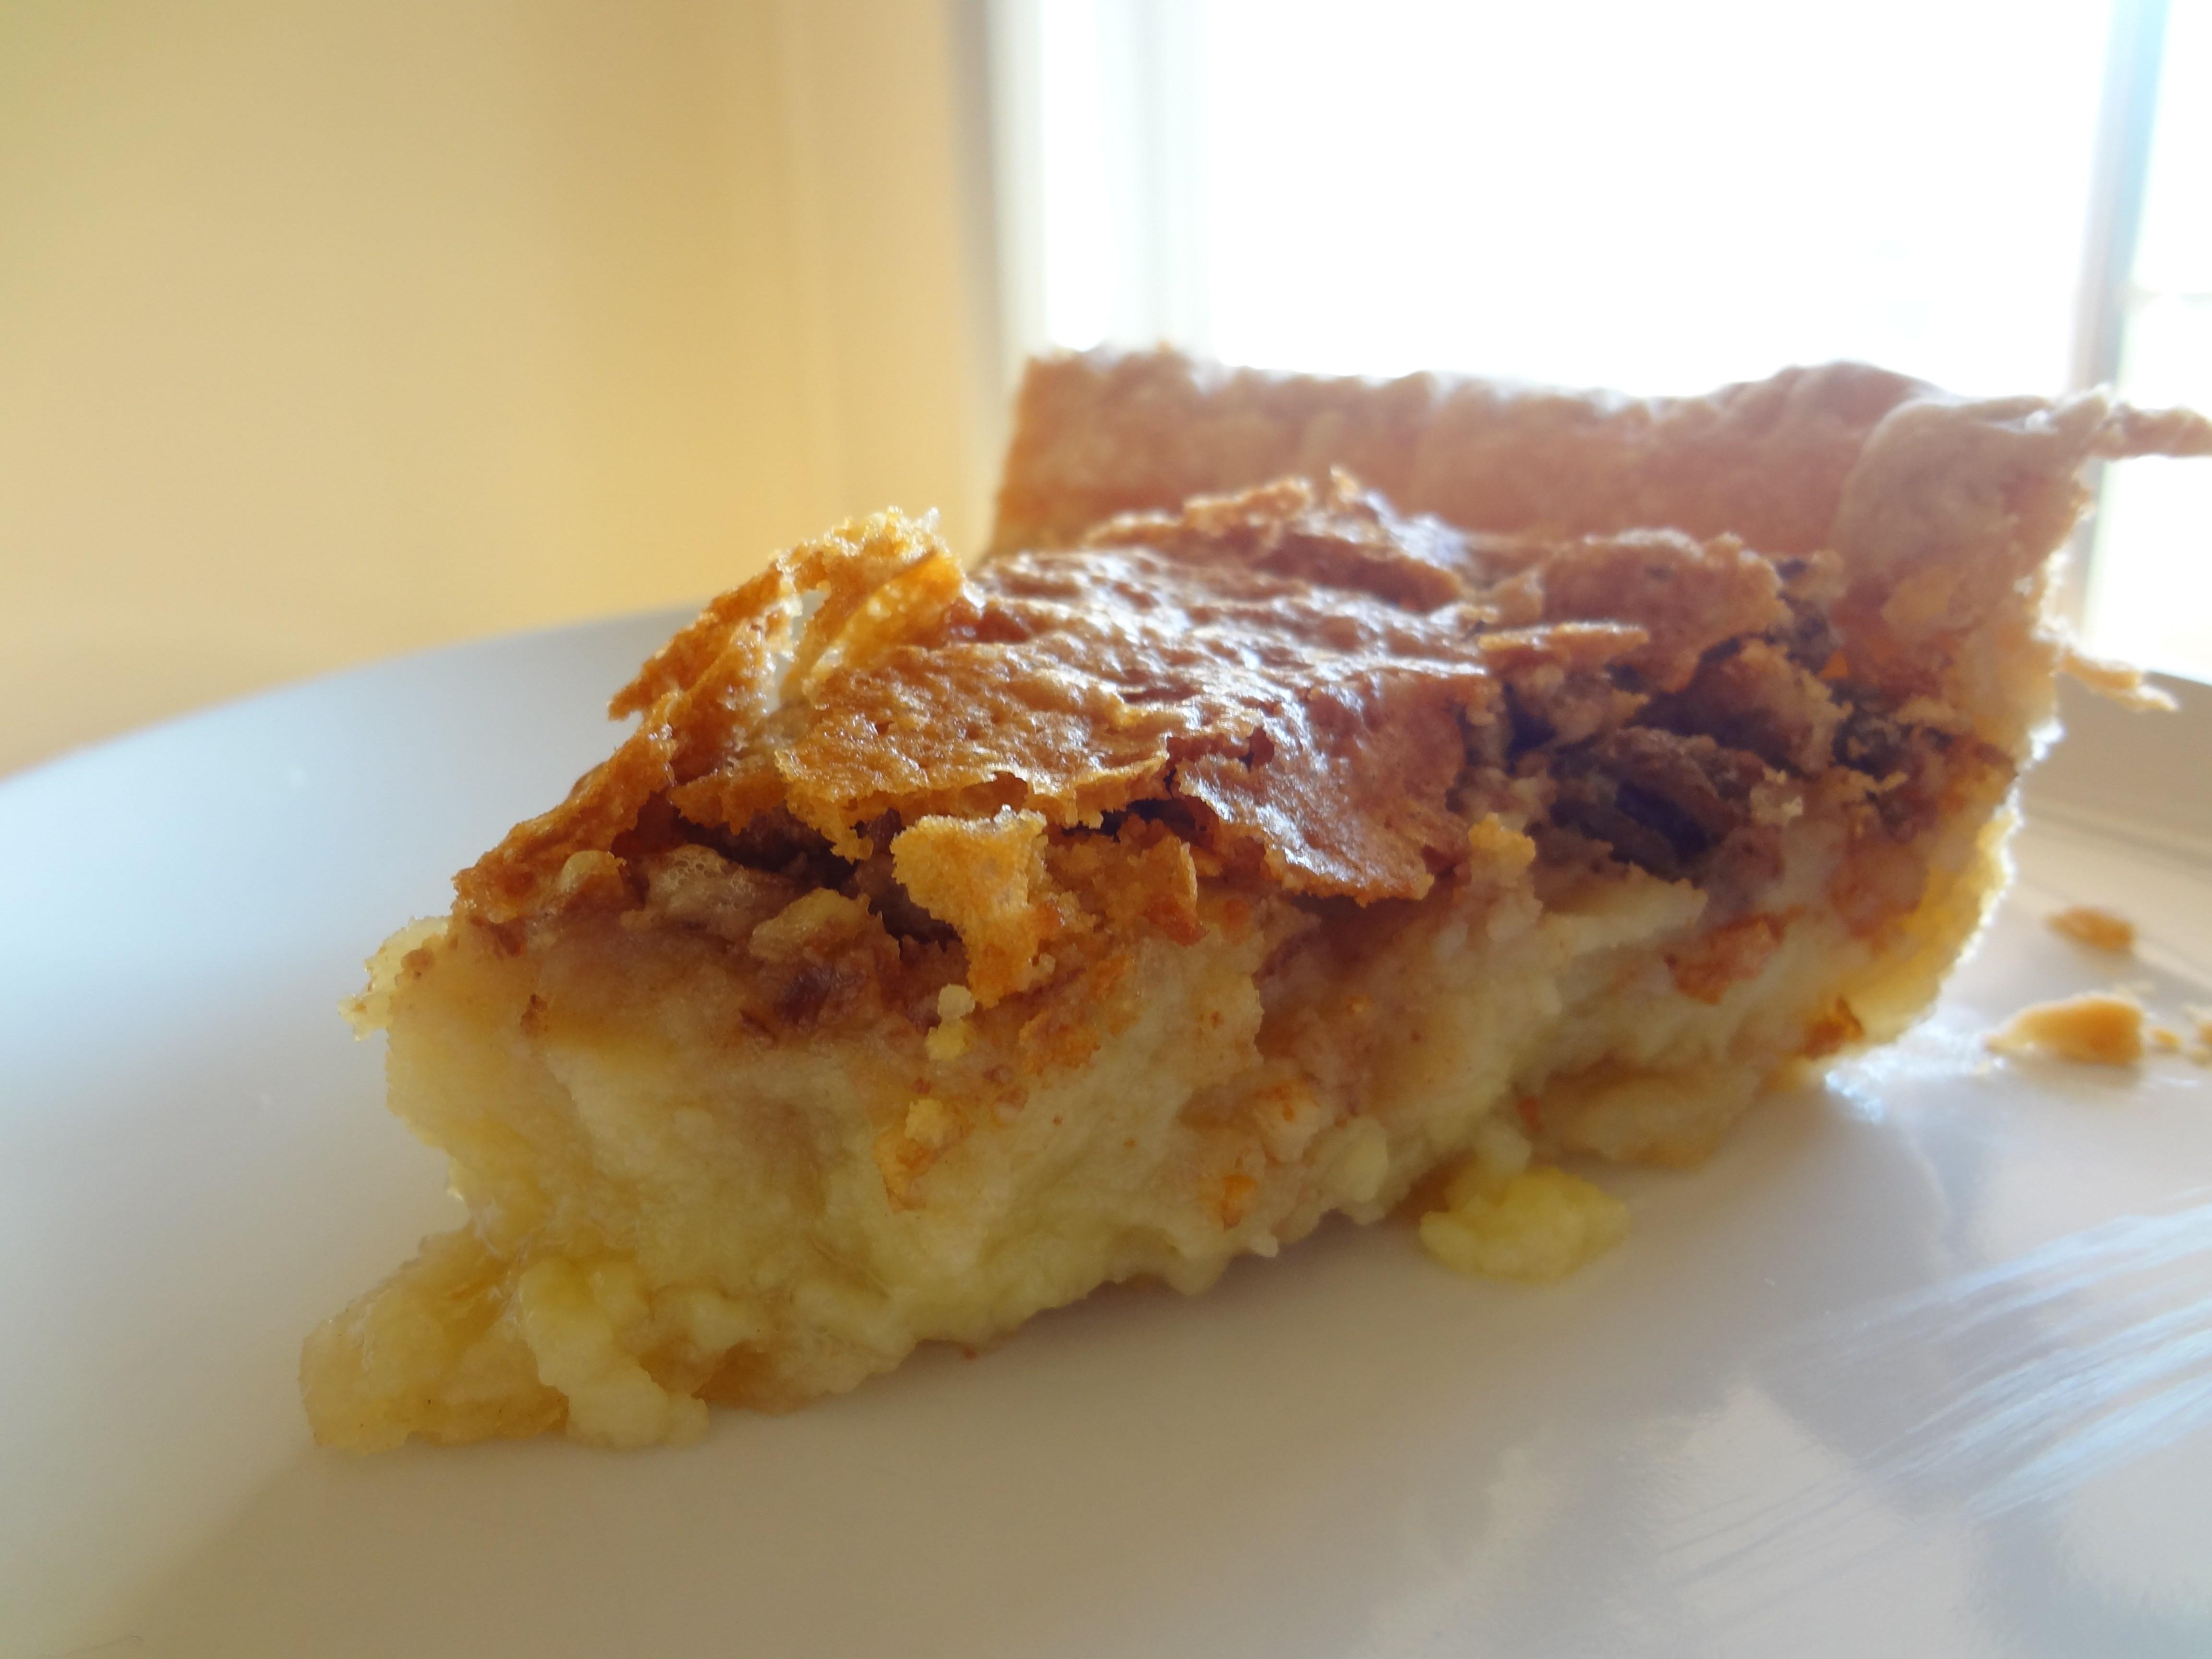 Buttermilk Pecan Pie  Buttermilk Pecan Pie The Pickled Beat